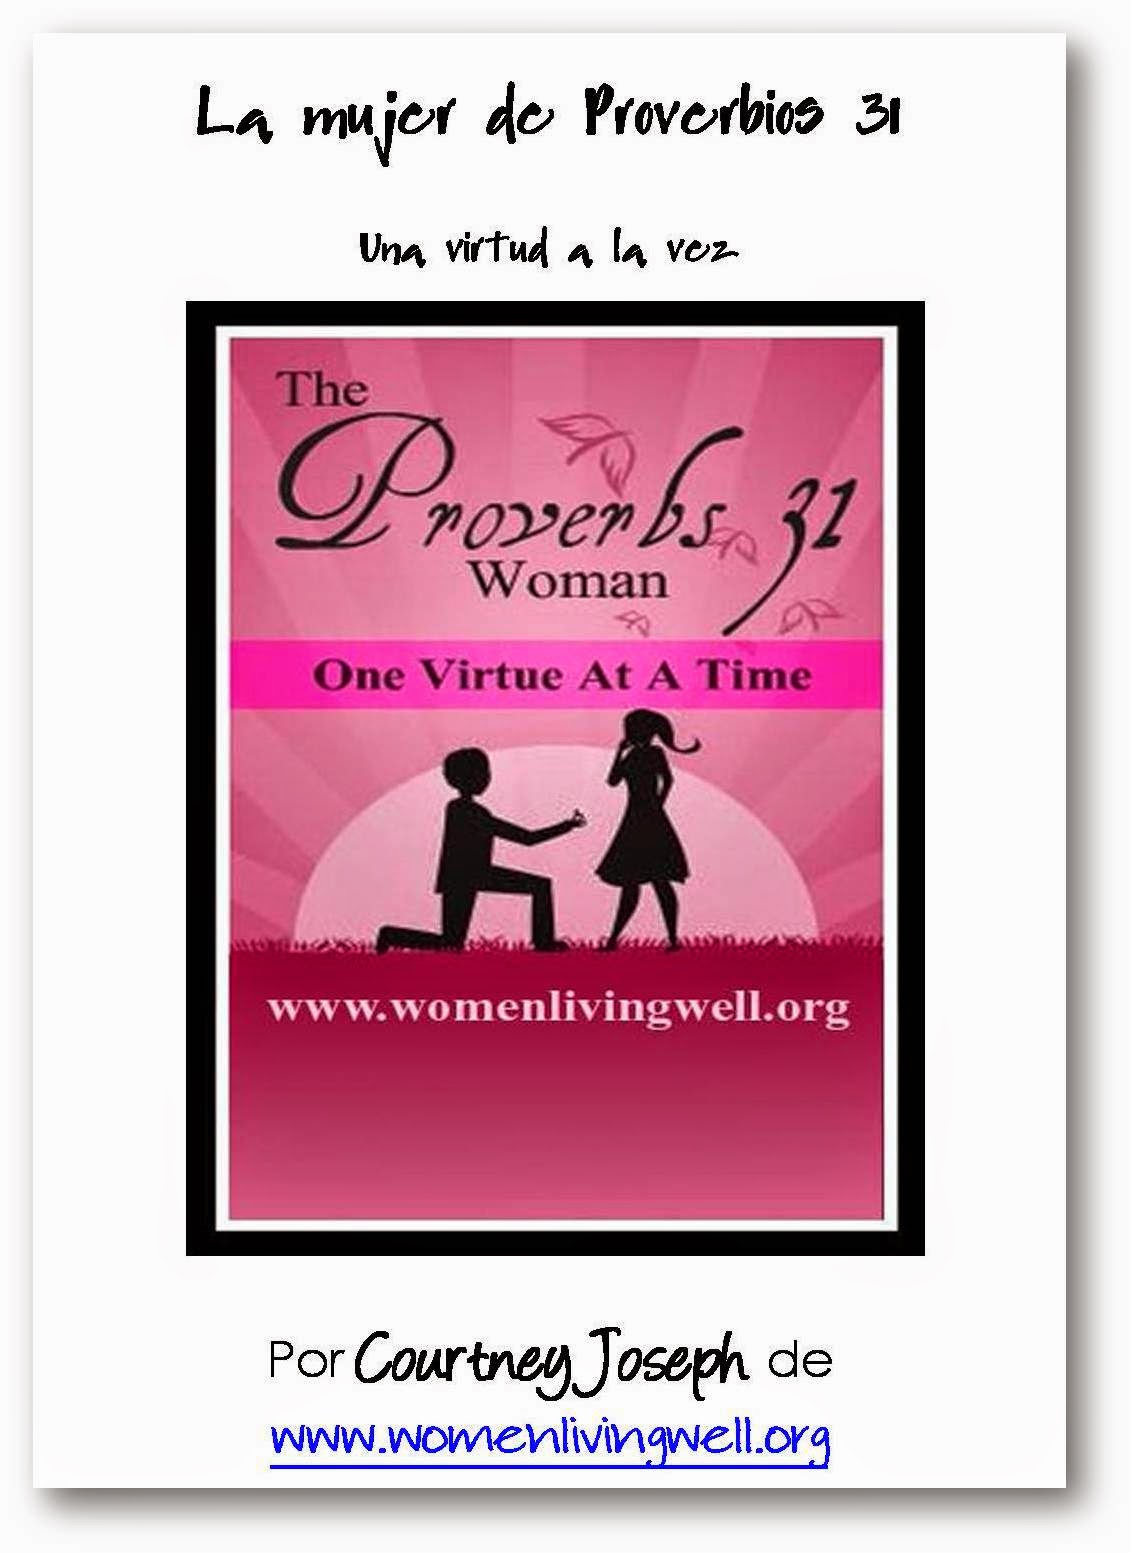 https://familianieves.files.wordpress.com/2013/01/la-mujer-de-proverbios-31-una-virtud-a-la-vez.pdf